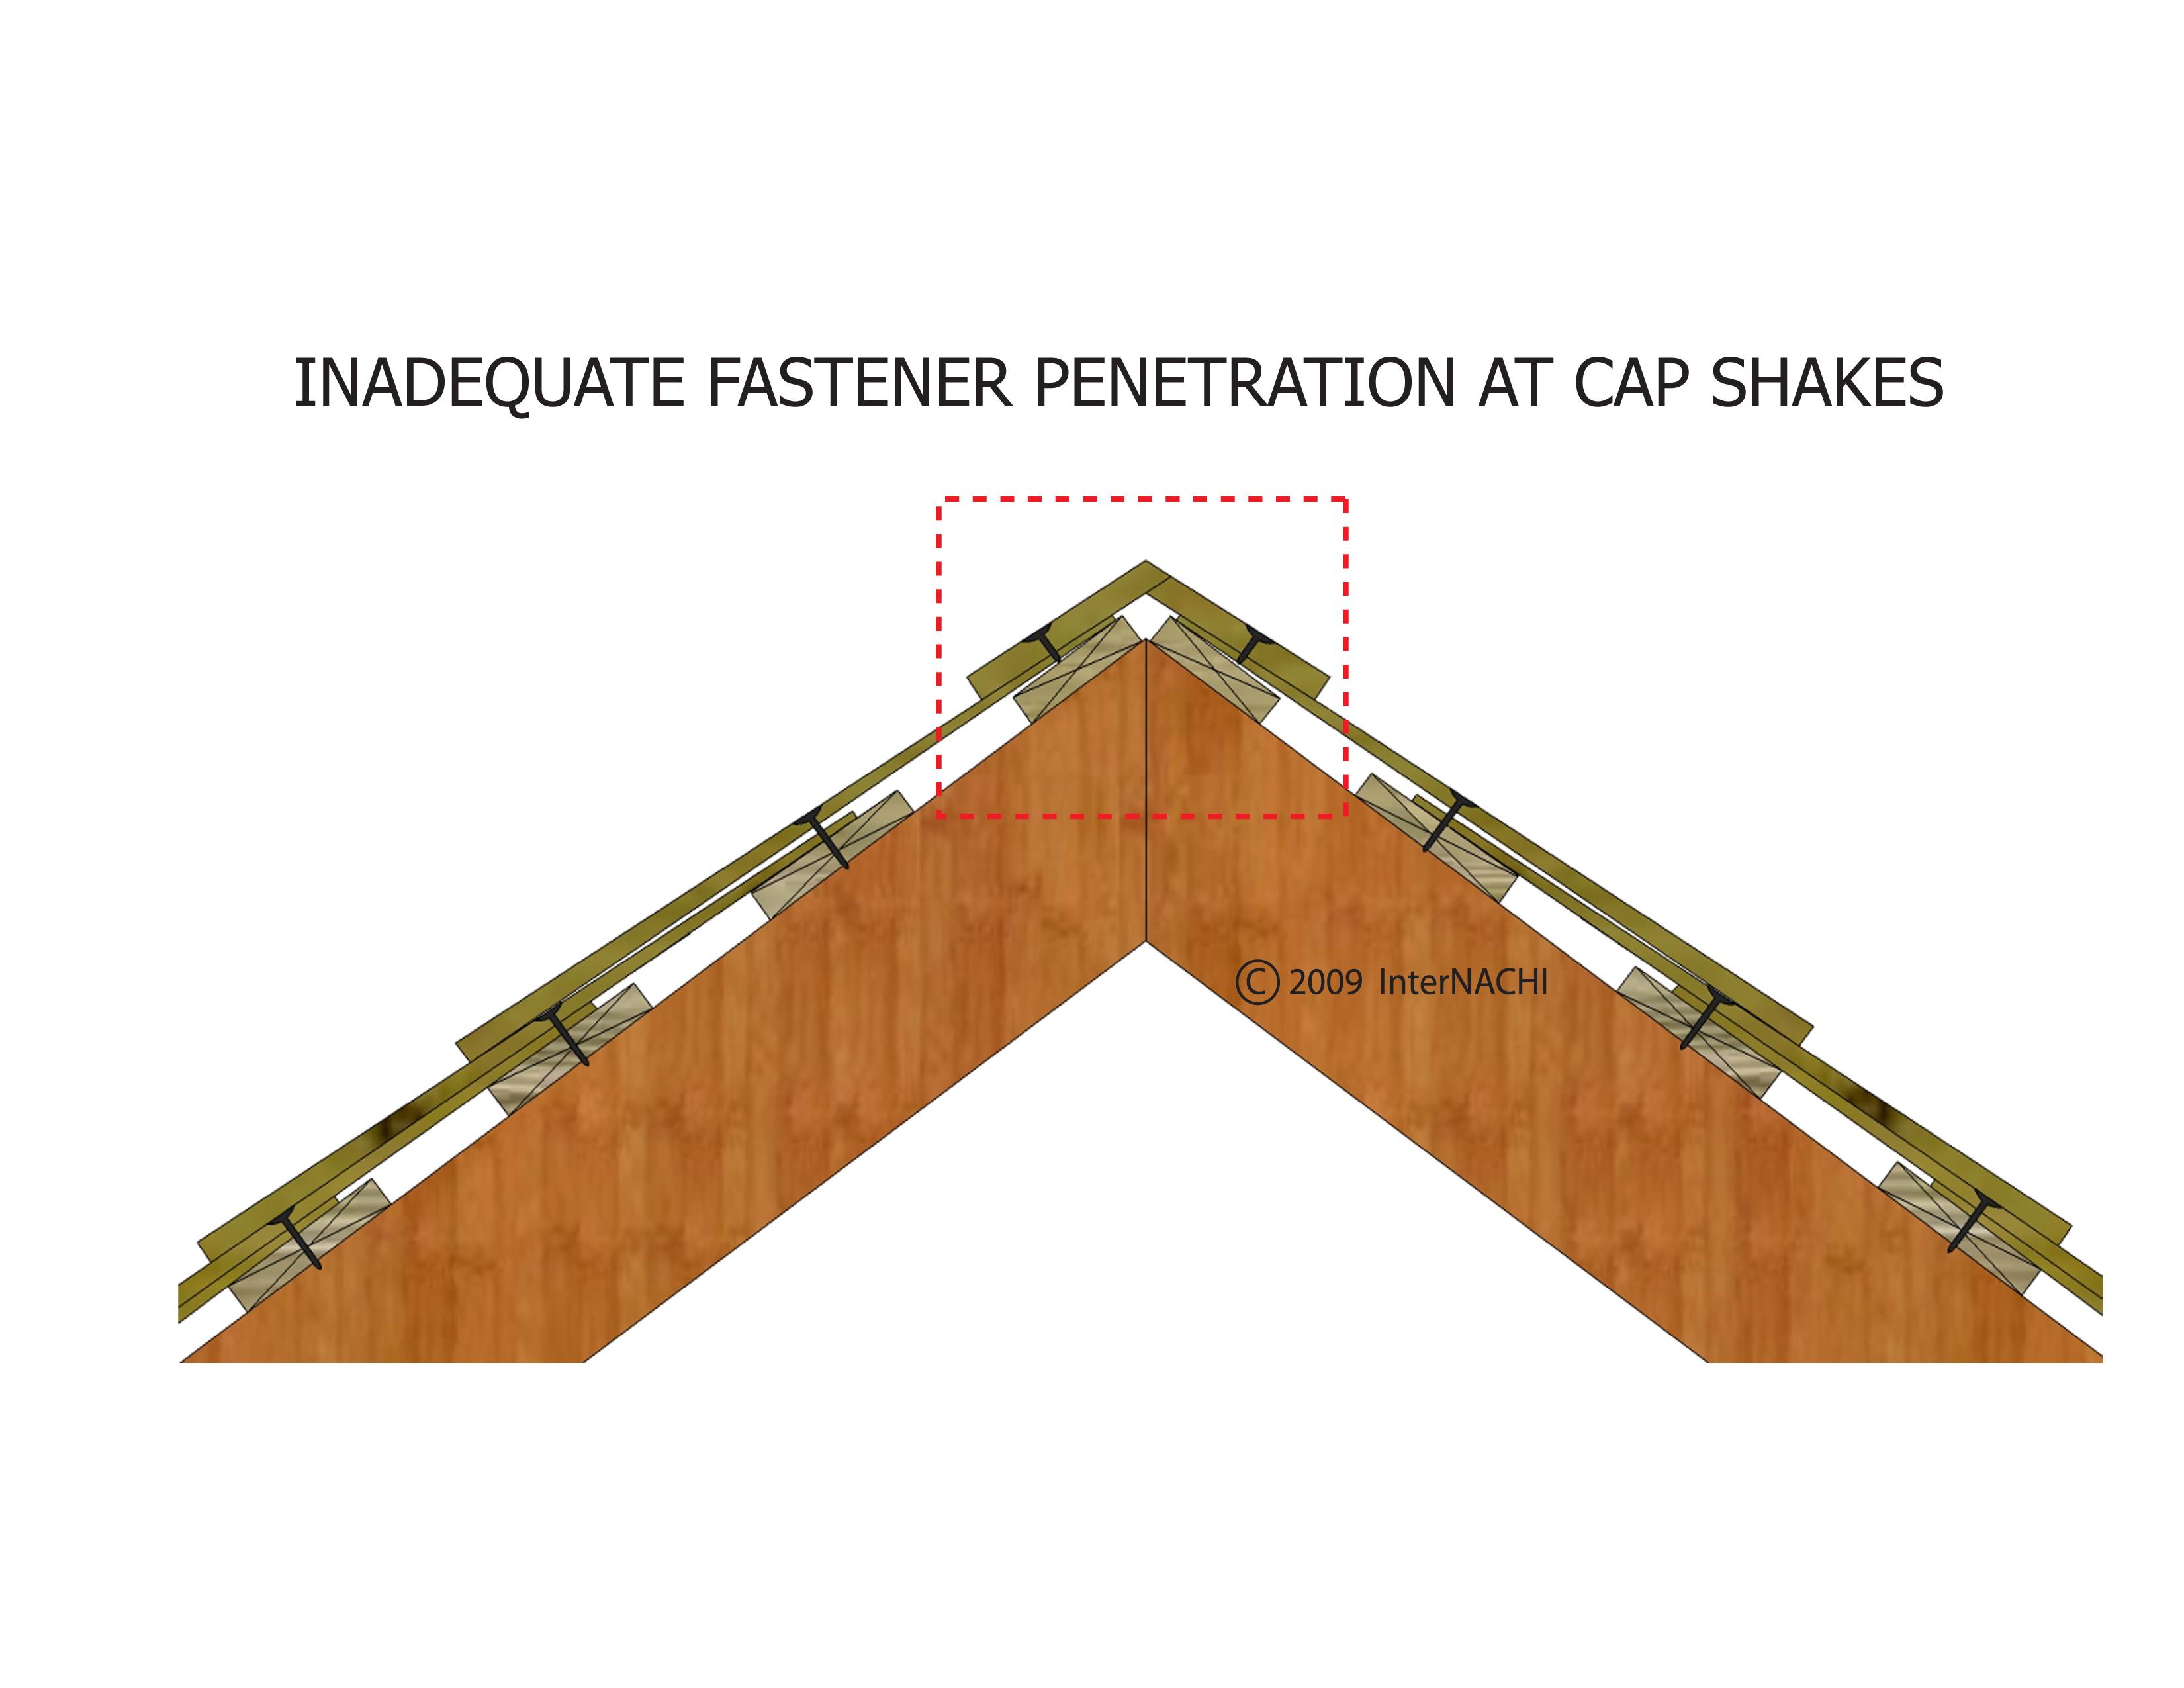 Inadequate fastener penetration at cap shakes.